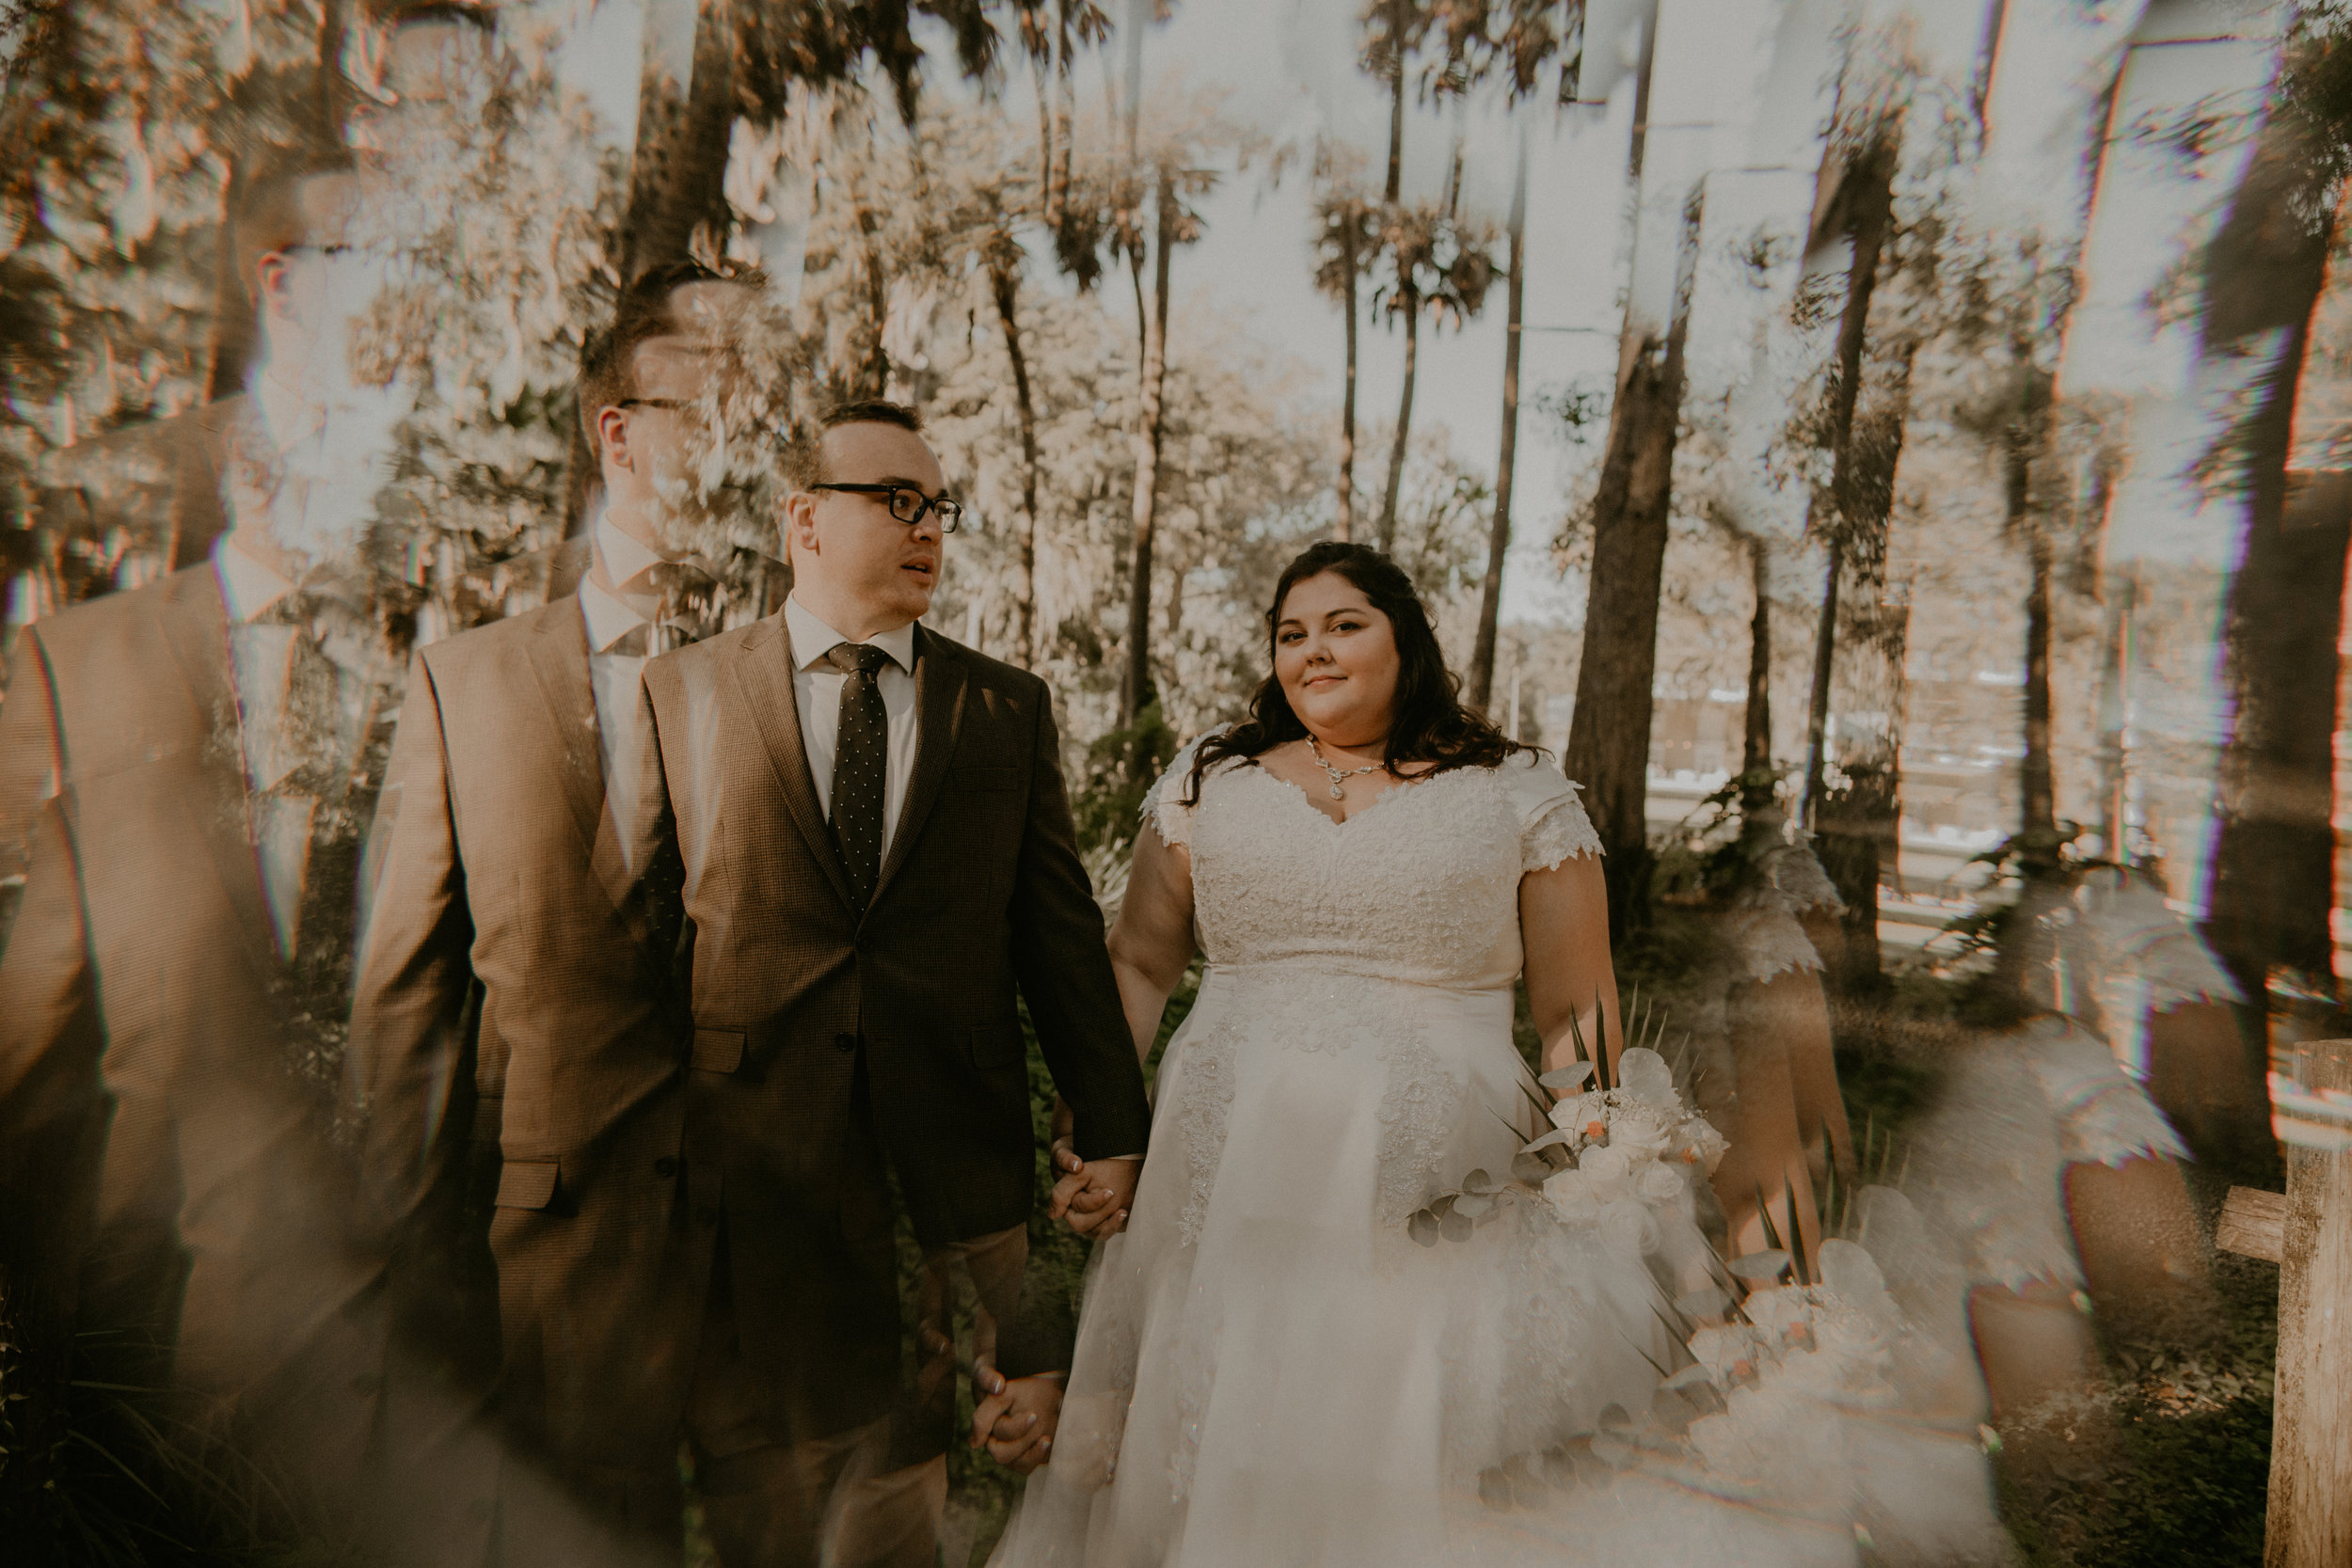 Silver Springs State Park Silver Springs Florida-Wedding-Kat and Tom34.JPG